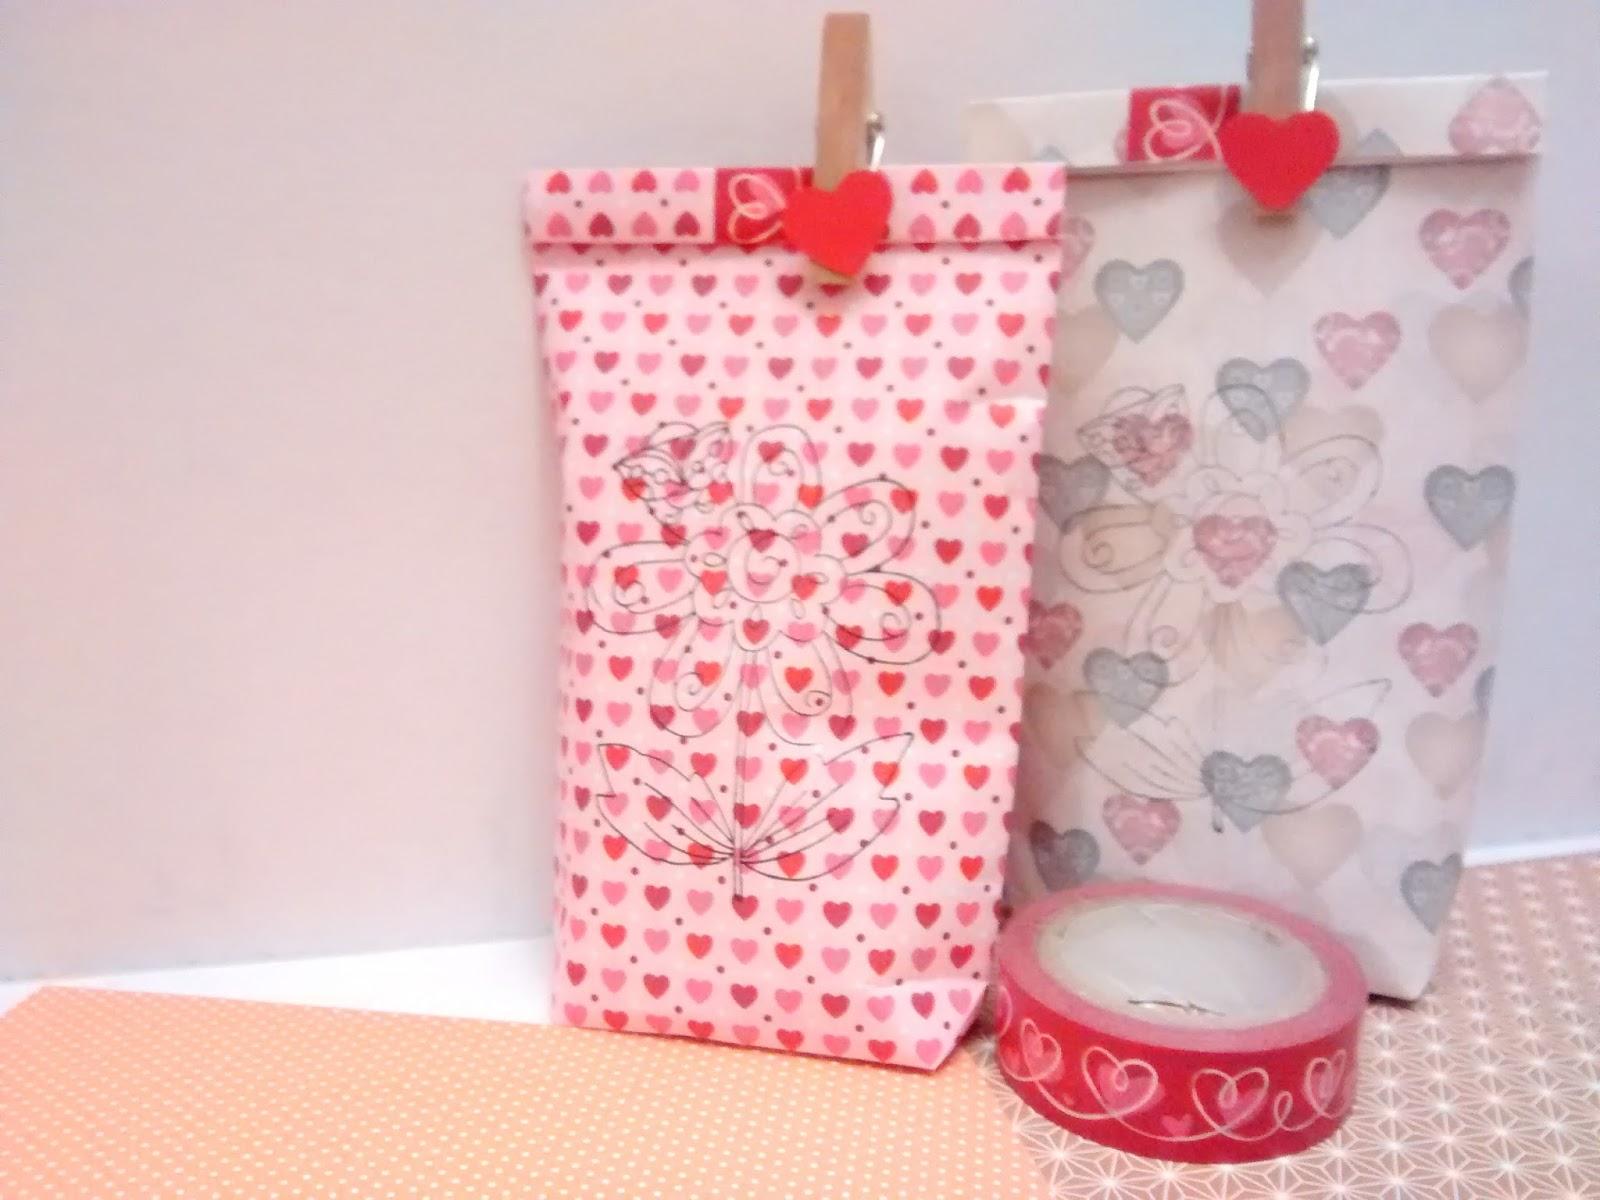 C mo hacer bolsas de papel para regalo gloriarte crochet - Hacer bolsas de papel en casa ...